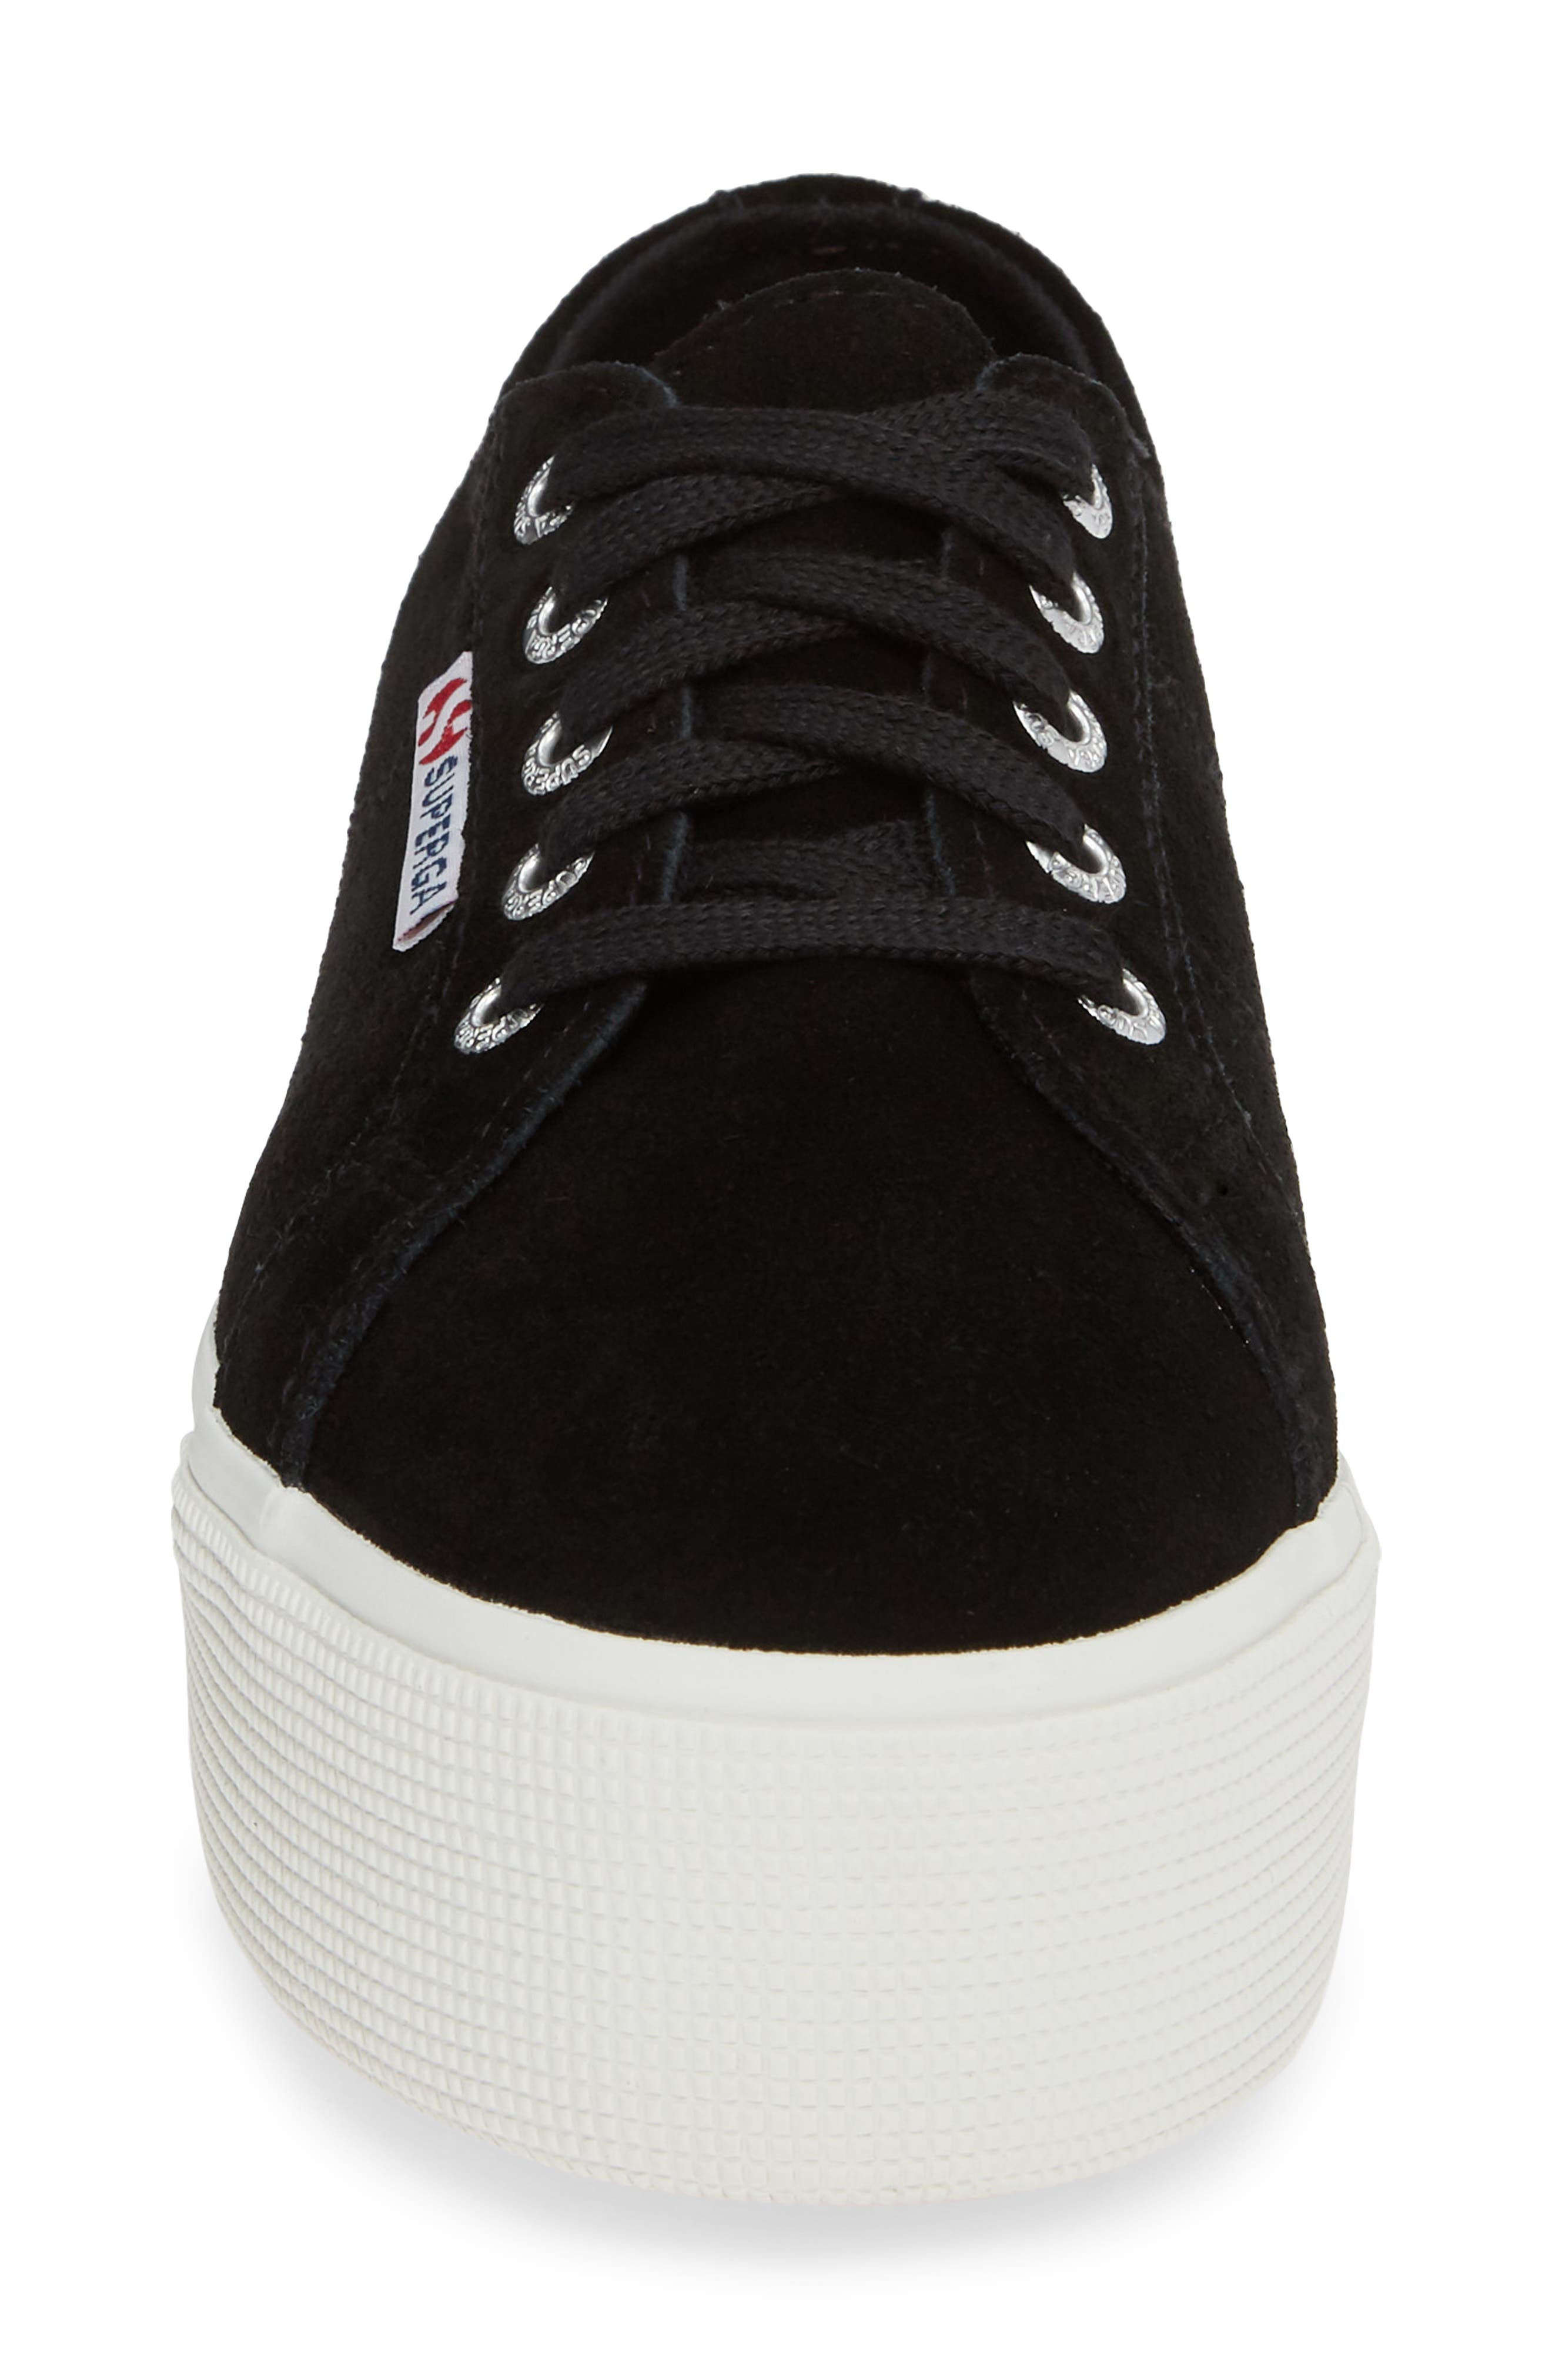 2790 Platform Sneaker,                             Alternate thumbnail 4, color,                             006